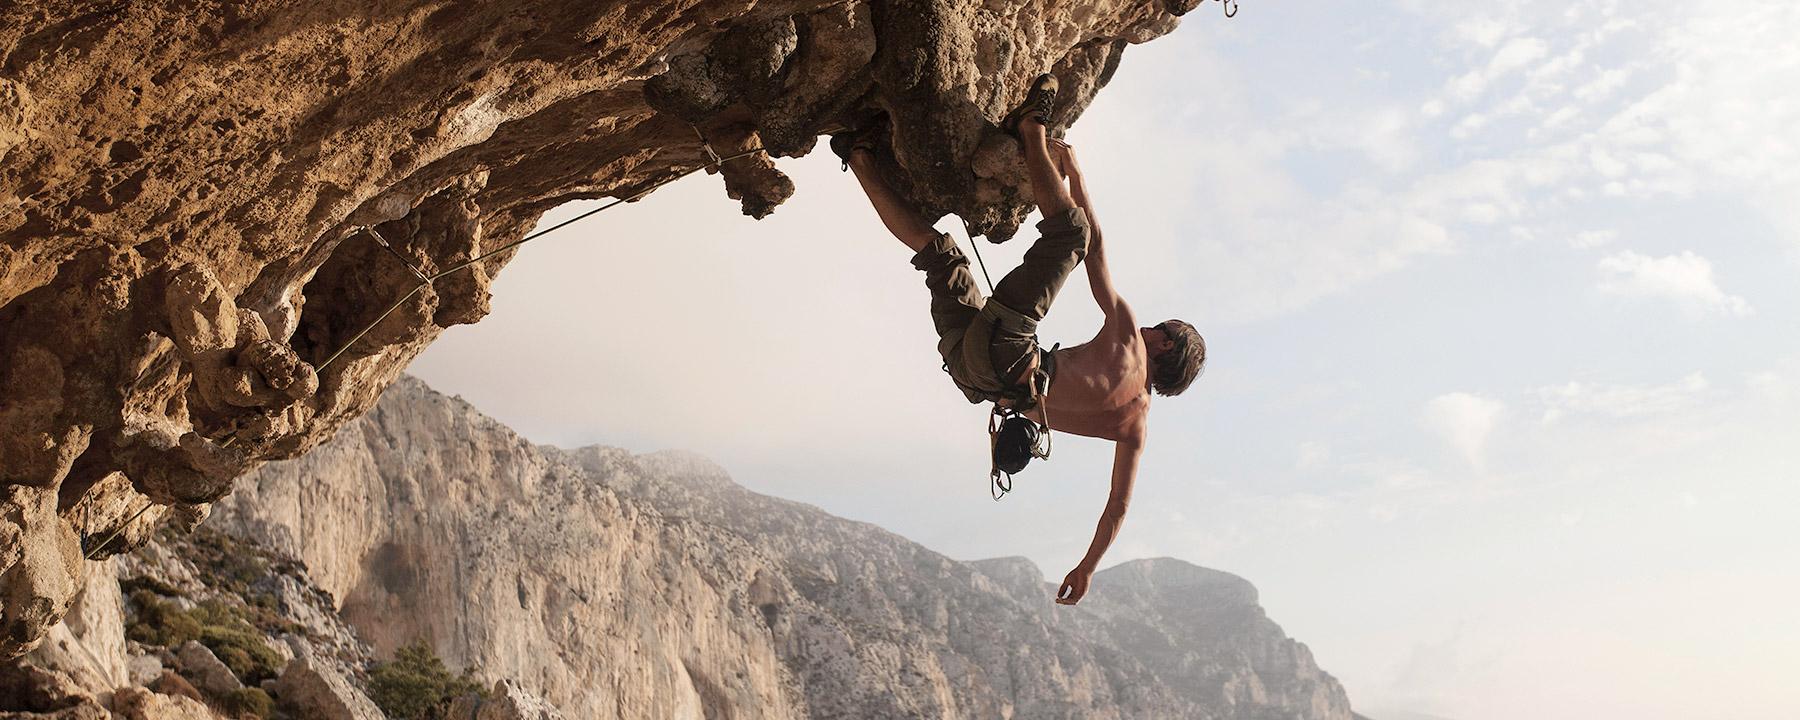 Adenture sports - Rock climbing